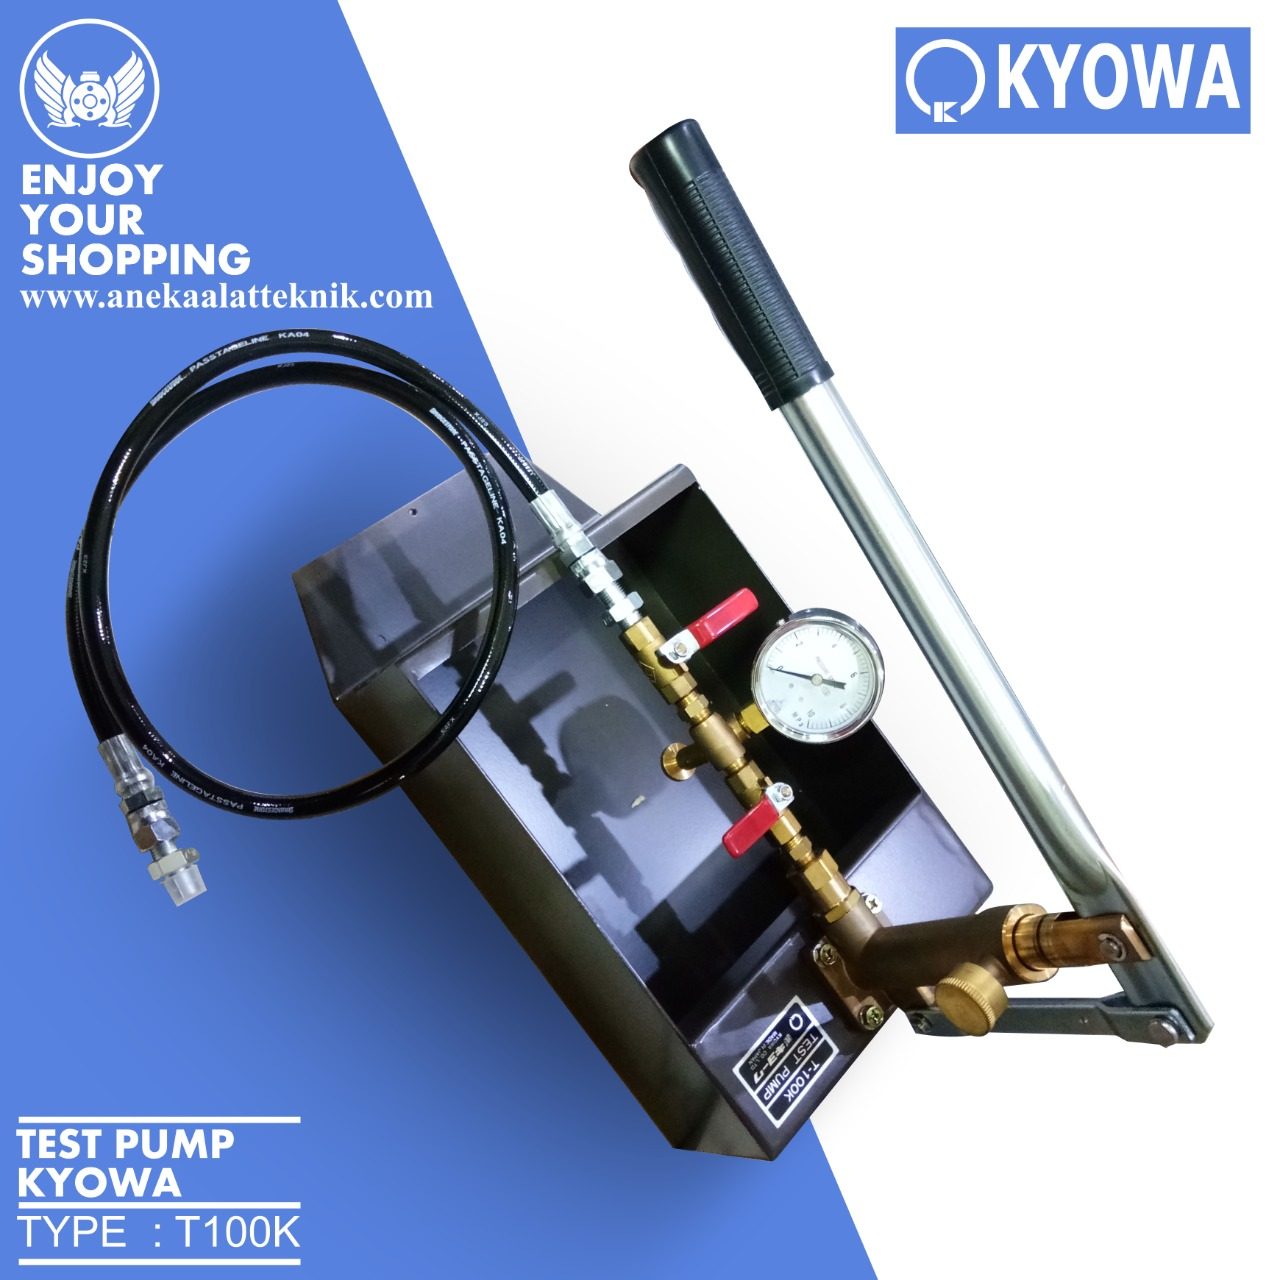 Mesin Test Pump & Tester Manual Kyowa T-100K Test Pump 100 KG